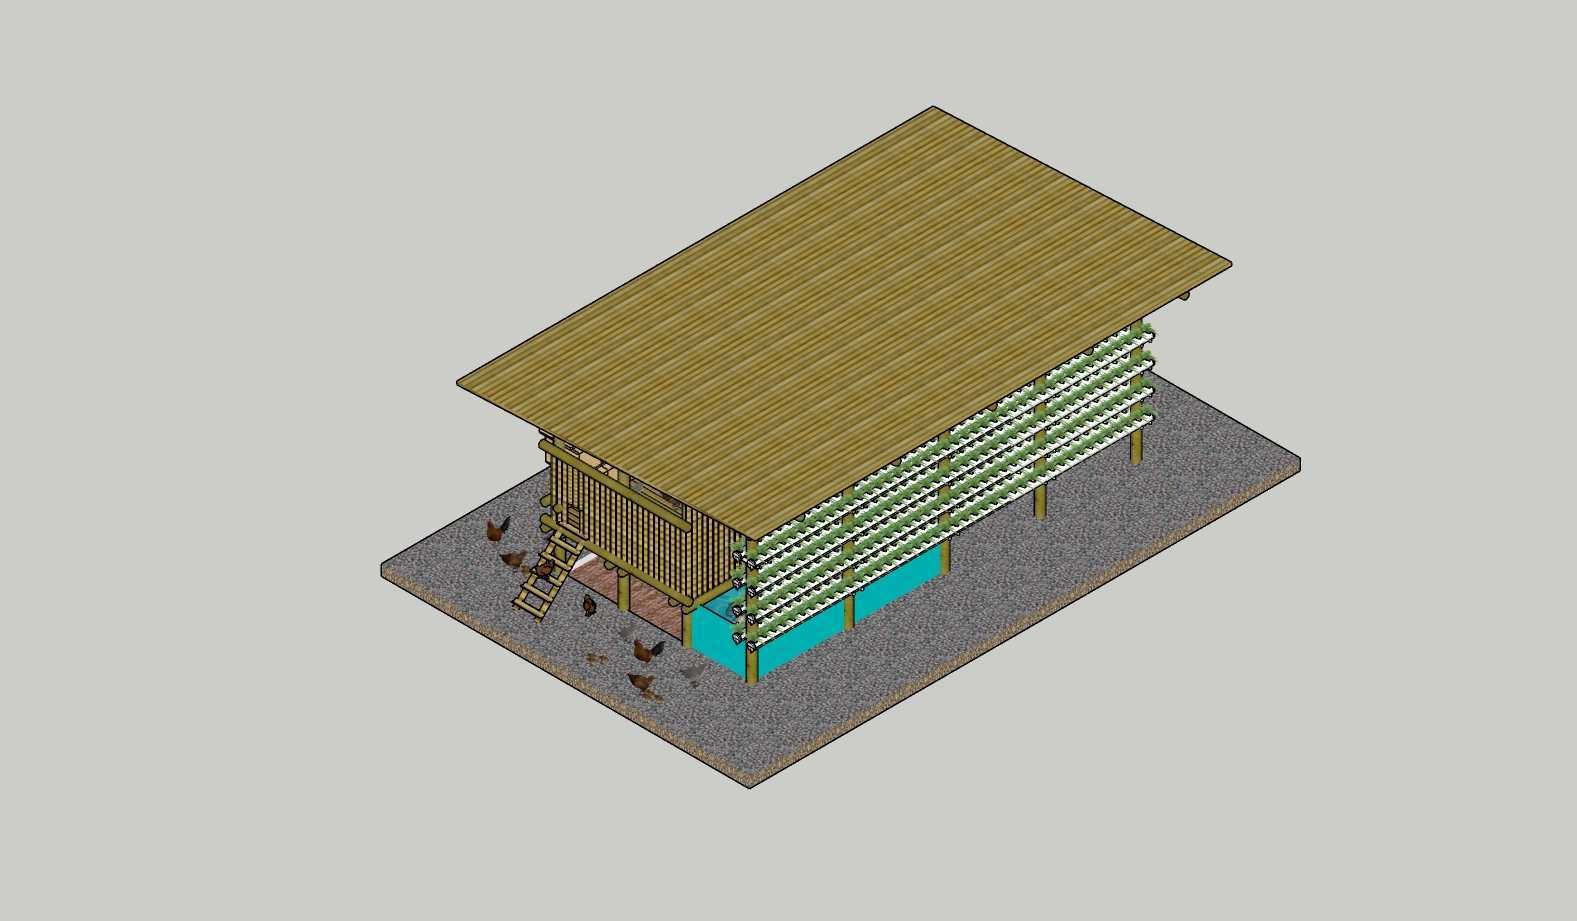 Jasa Design and Build Hatala Luwih Architect di Jombang